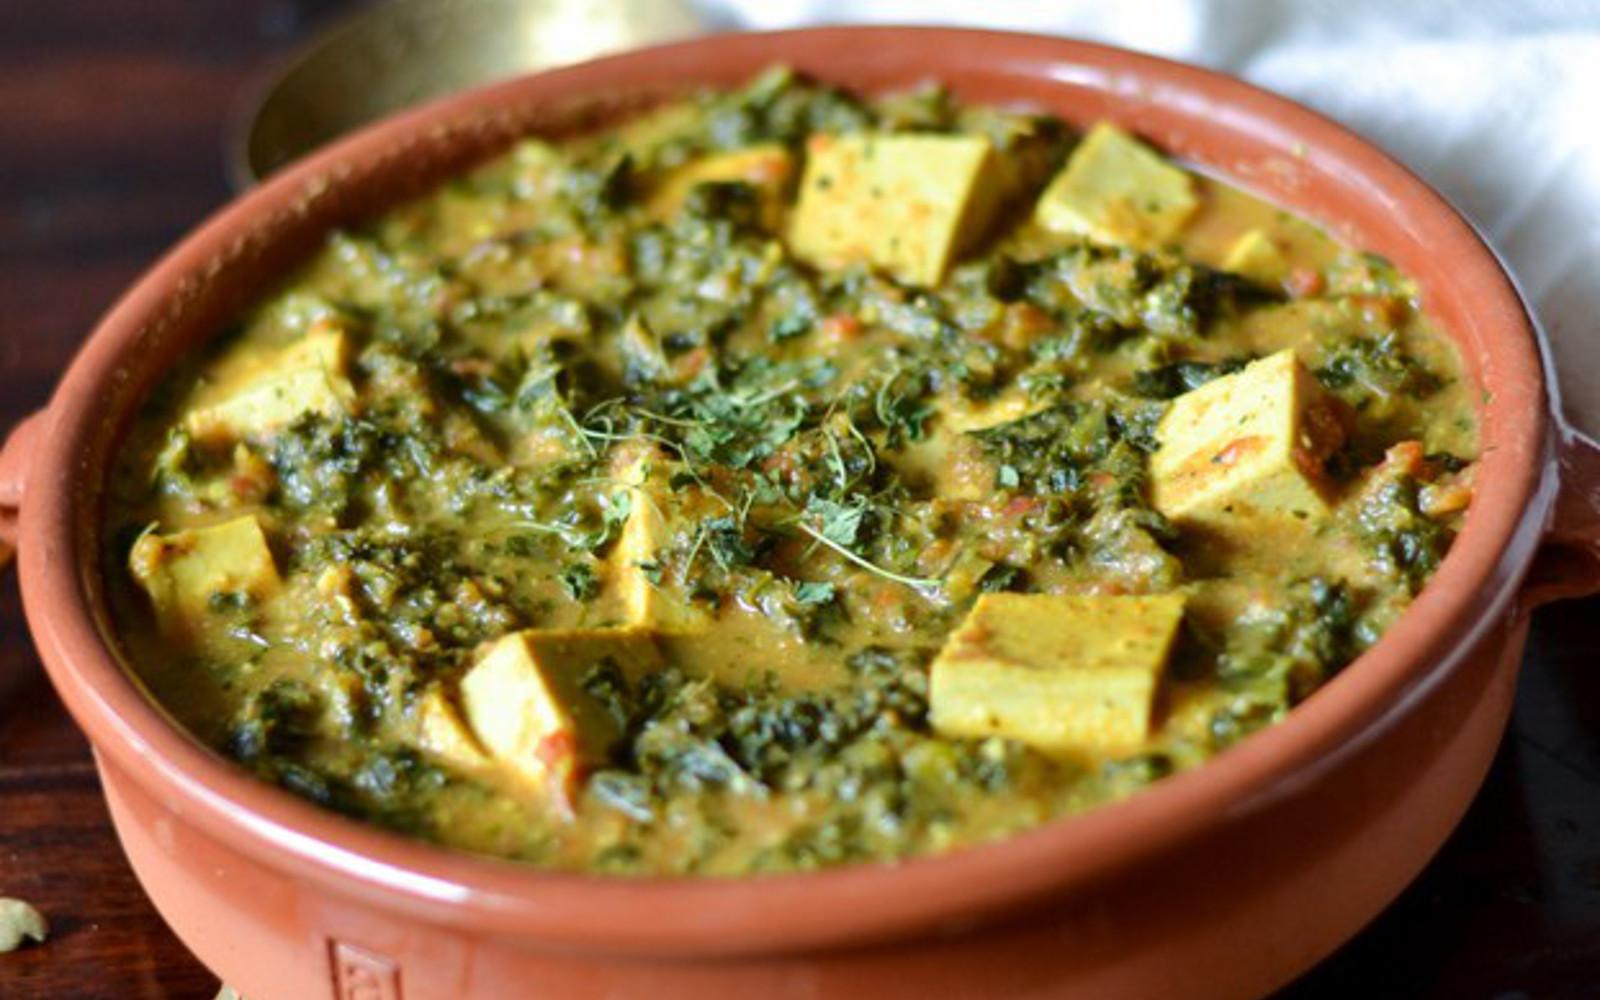 Tofu Curry Recipes  Kale Tofu Curry [Vegan Gluten Free] e Green Planet e